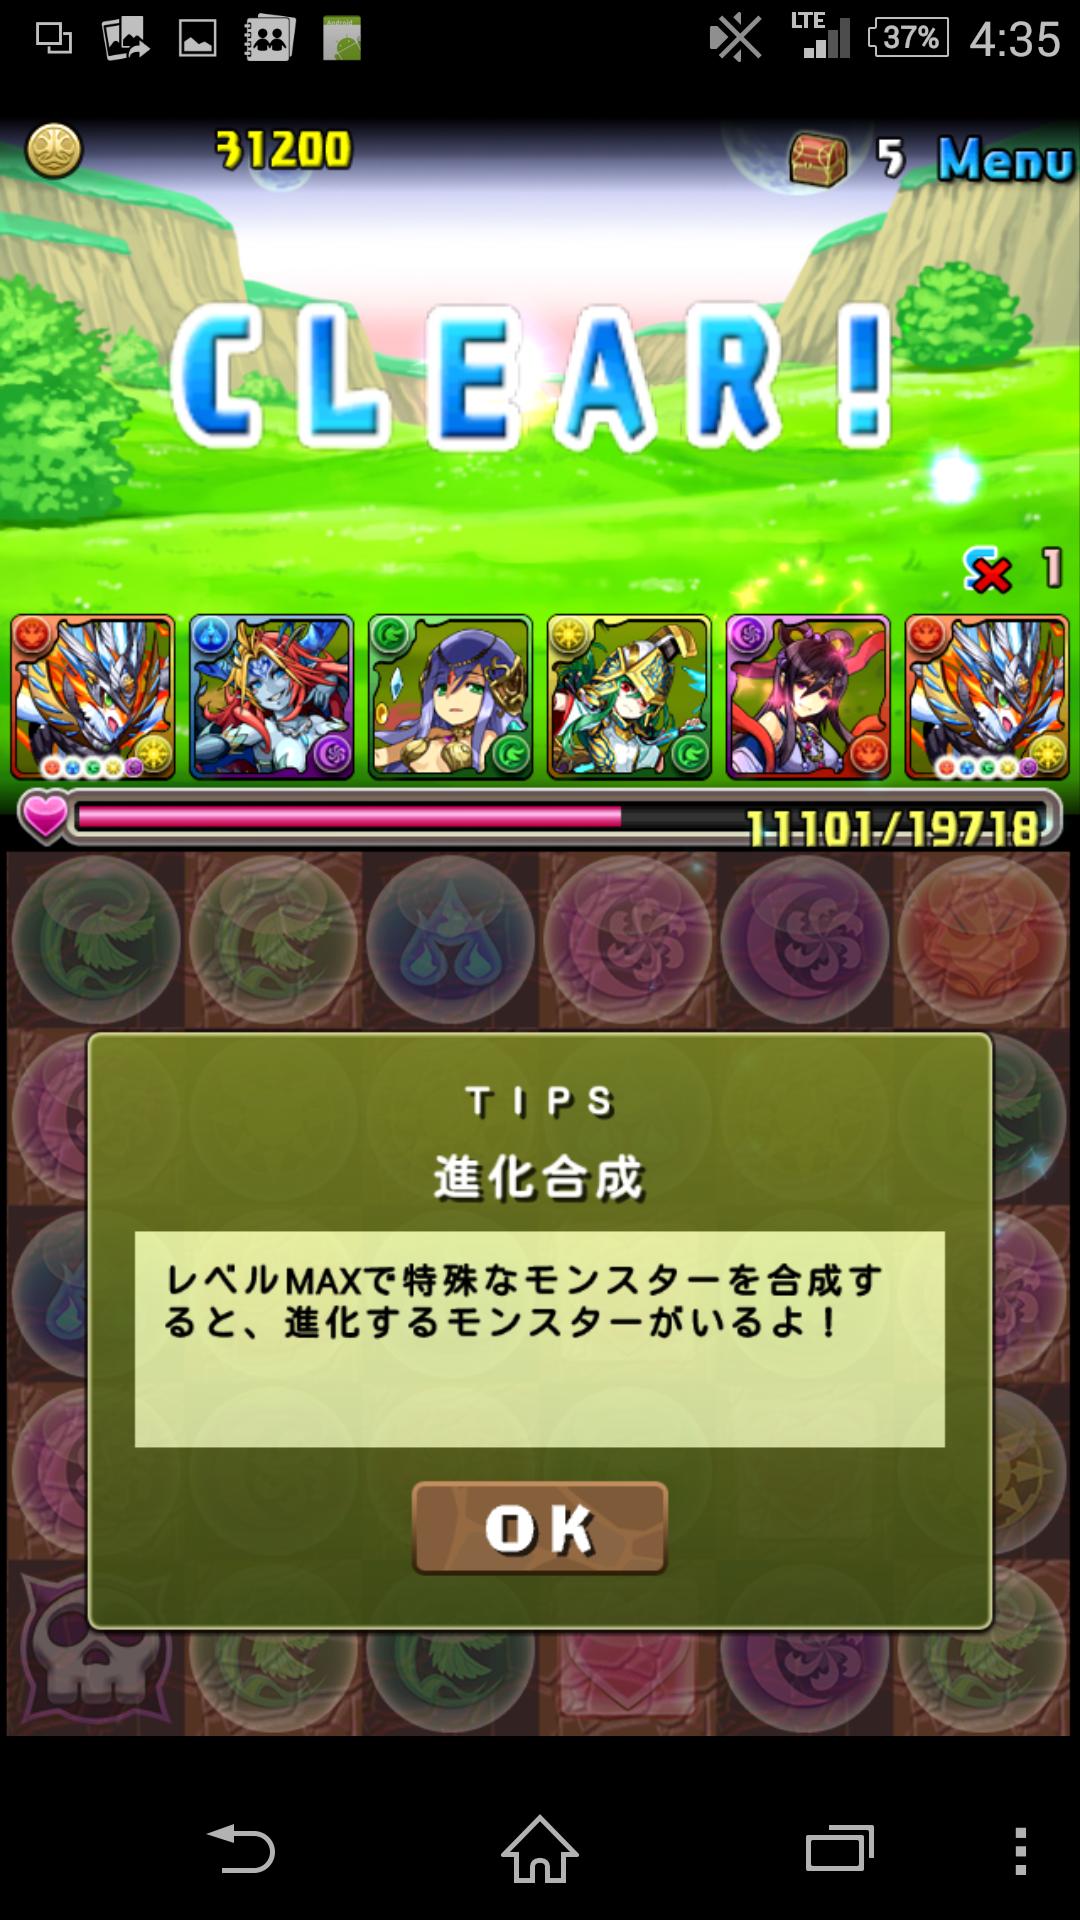 Screenshot_2014-09-24-04-35-22.png